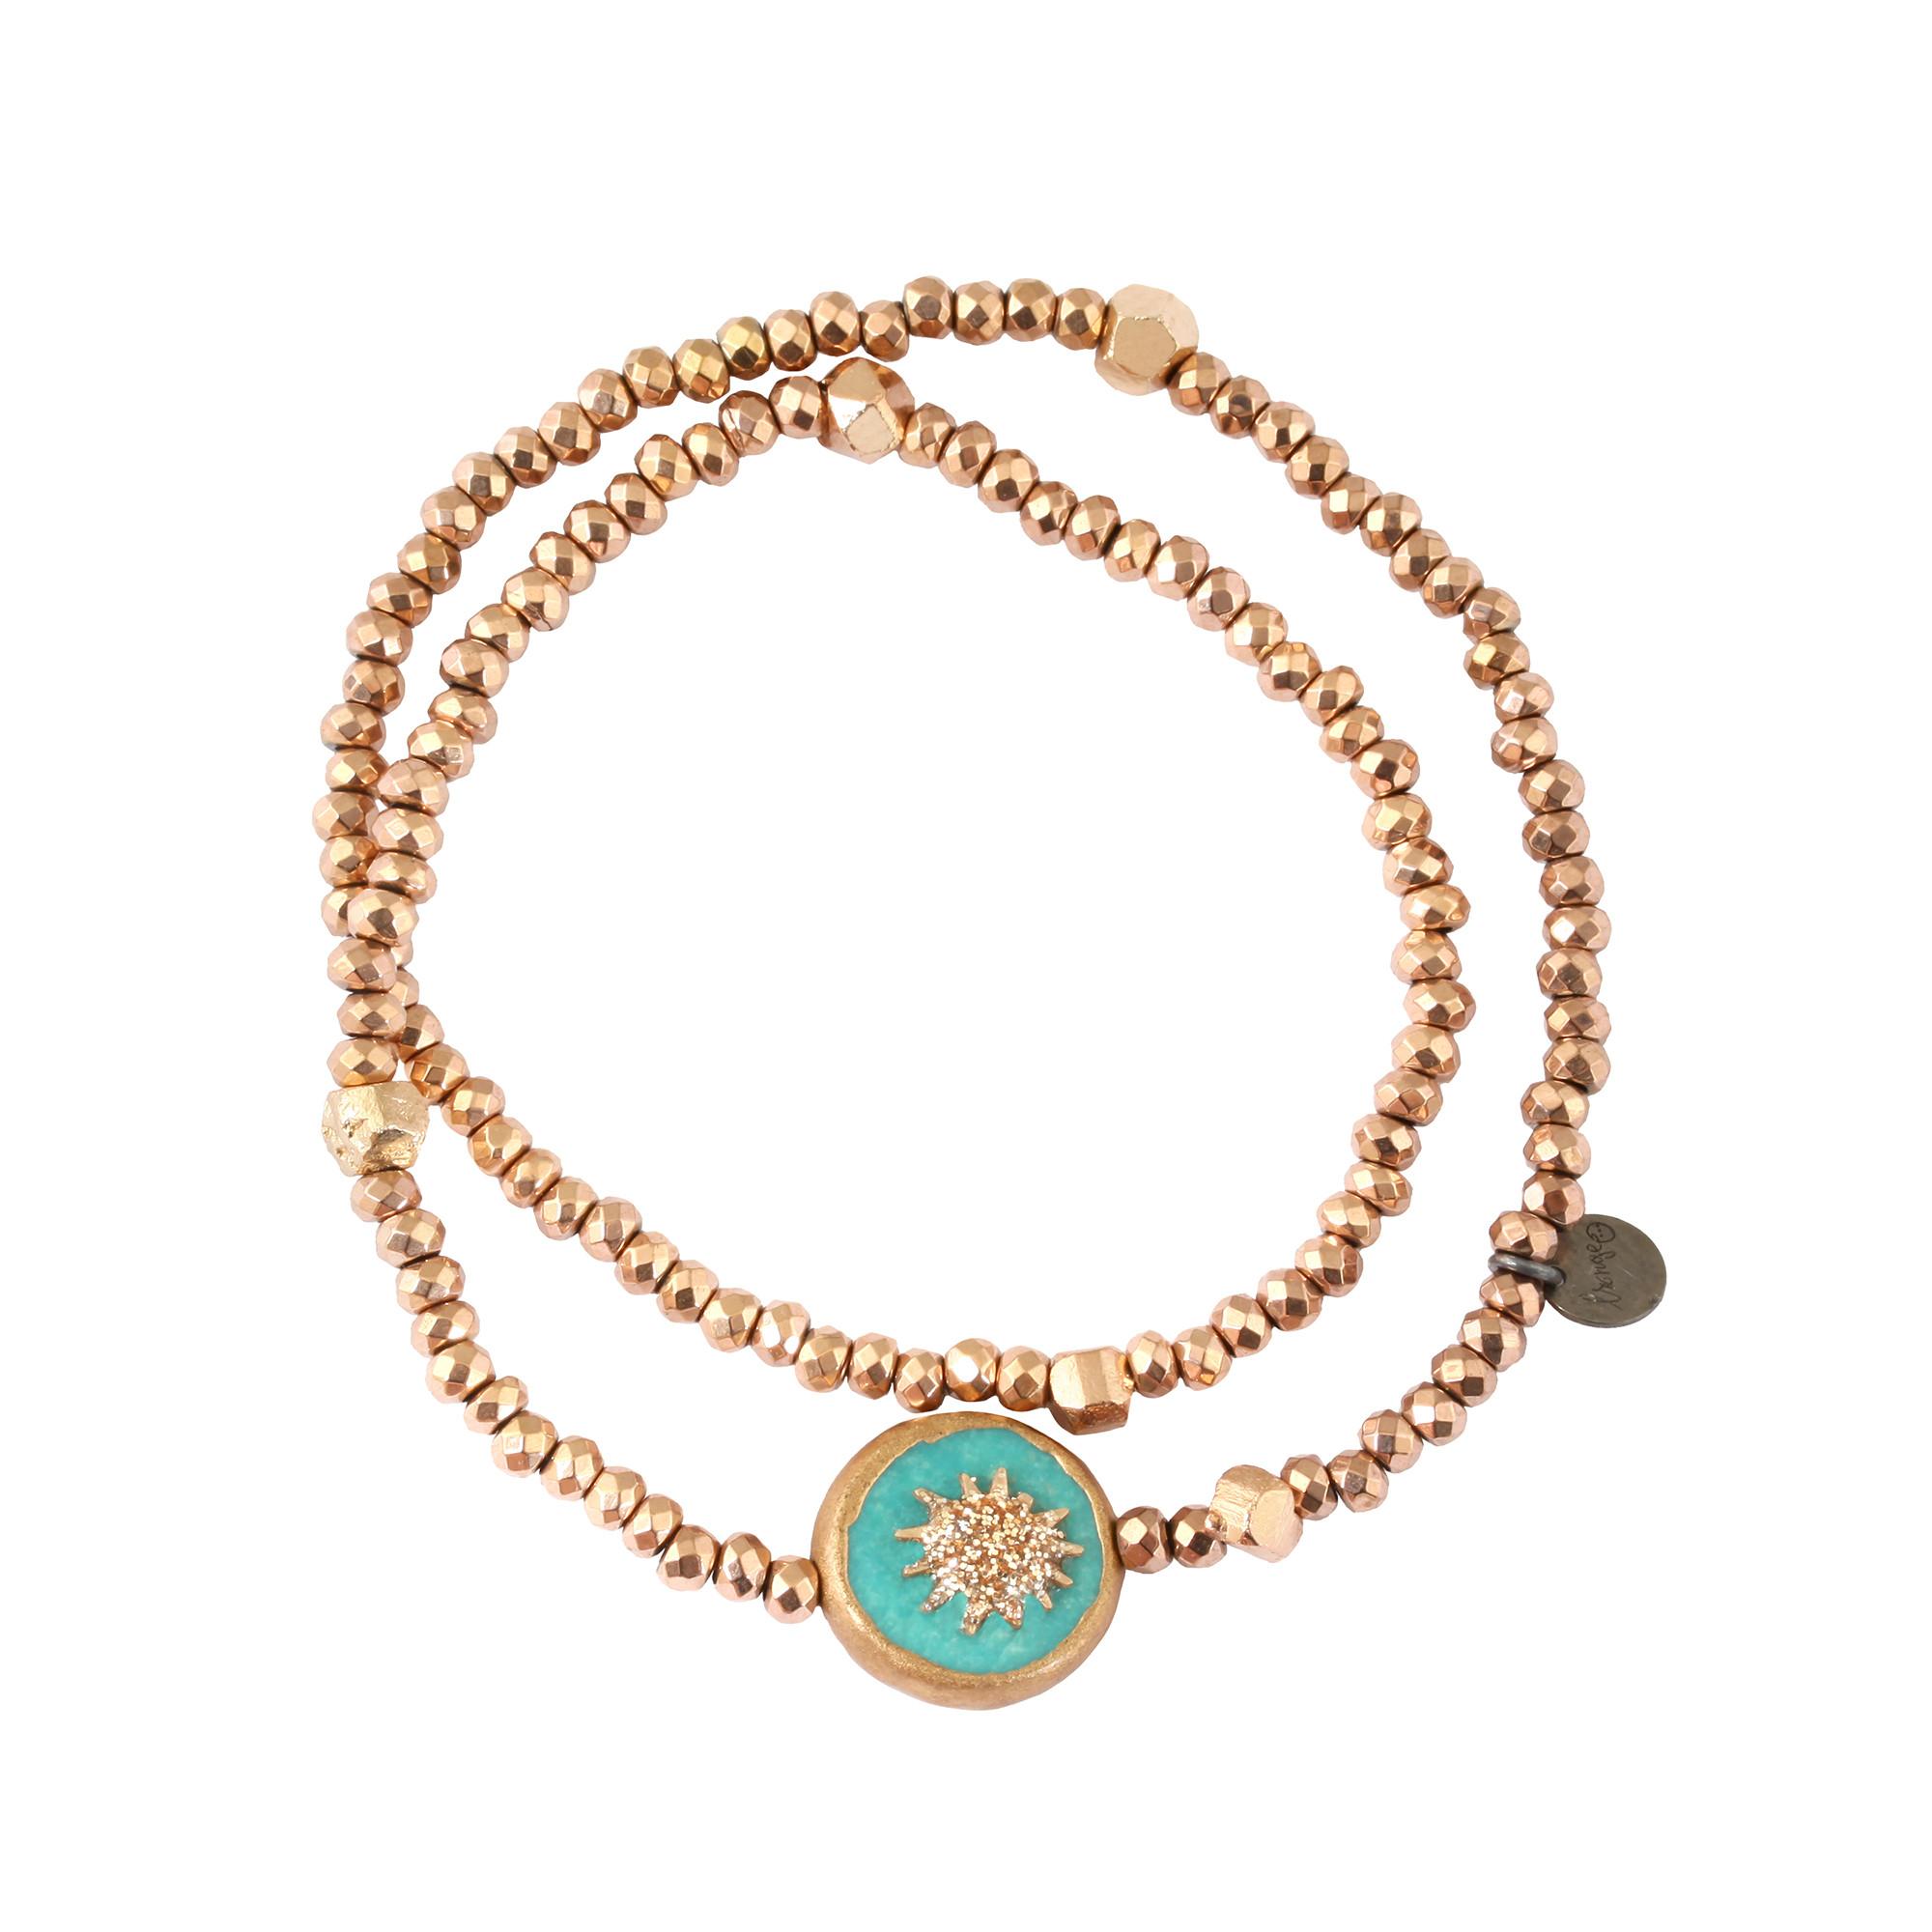 LSONGE - Bracelet Soleil Double Pyrite Rose 1 Turquoise